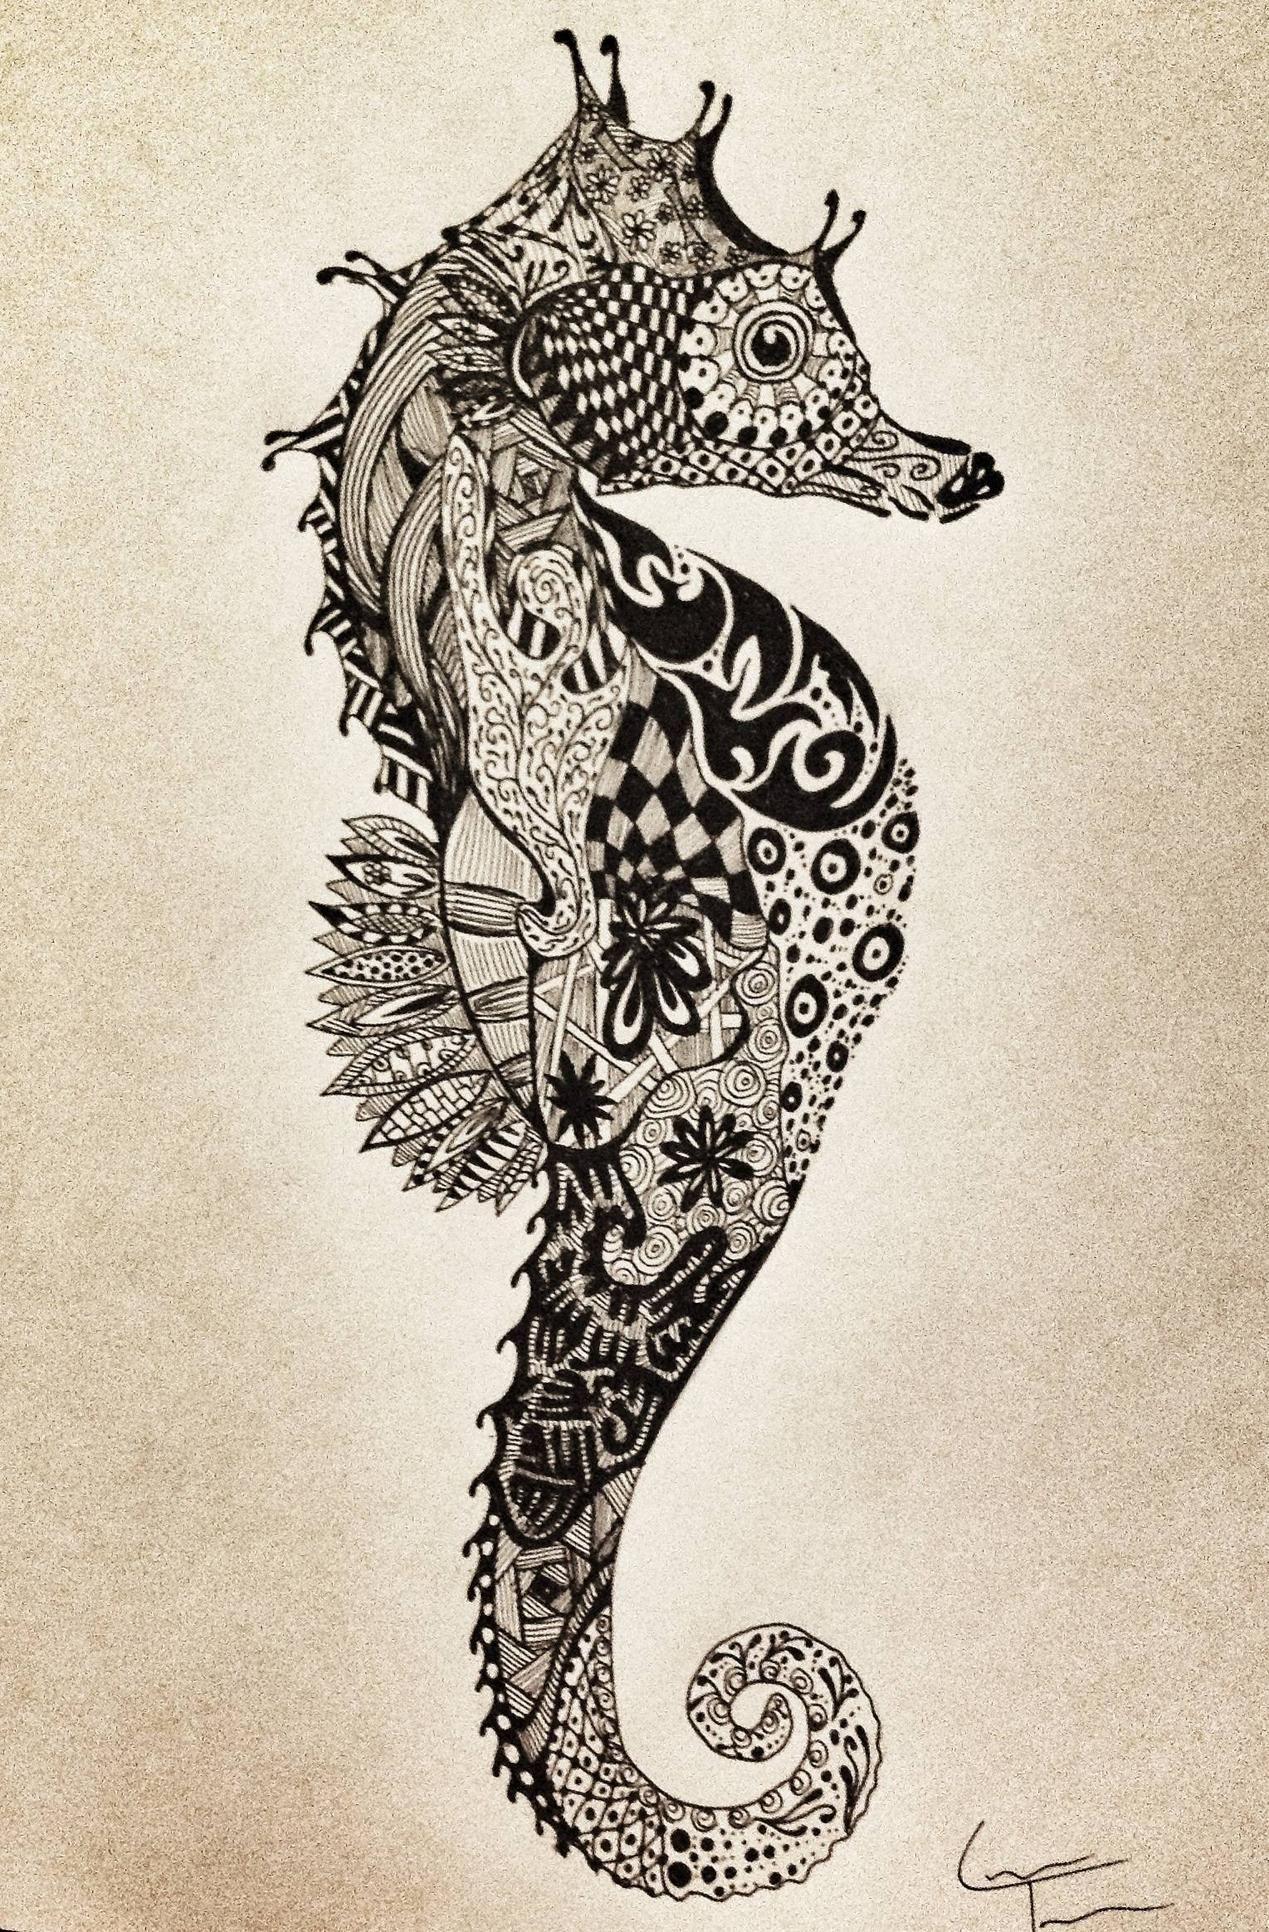 More Zentangle | Tatuajes, Dibujo y Caballos de mar